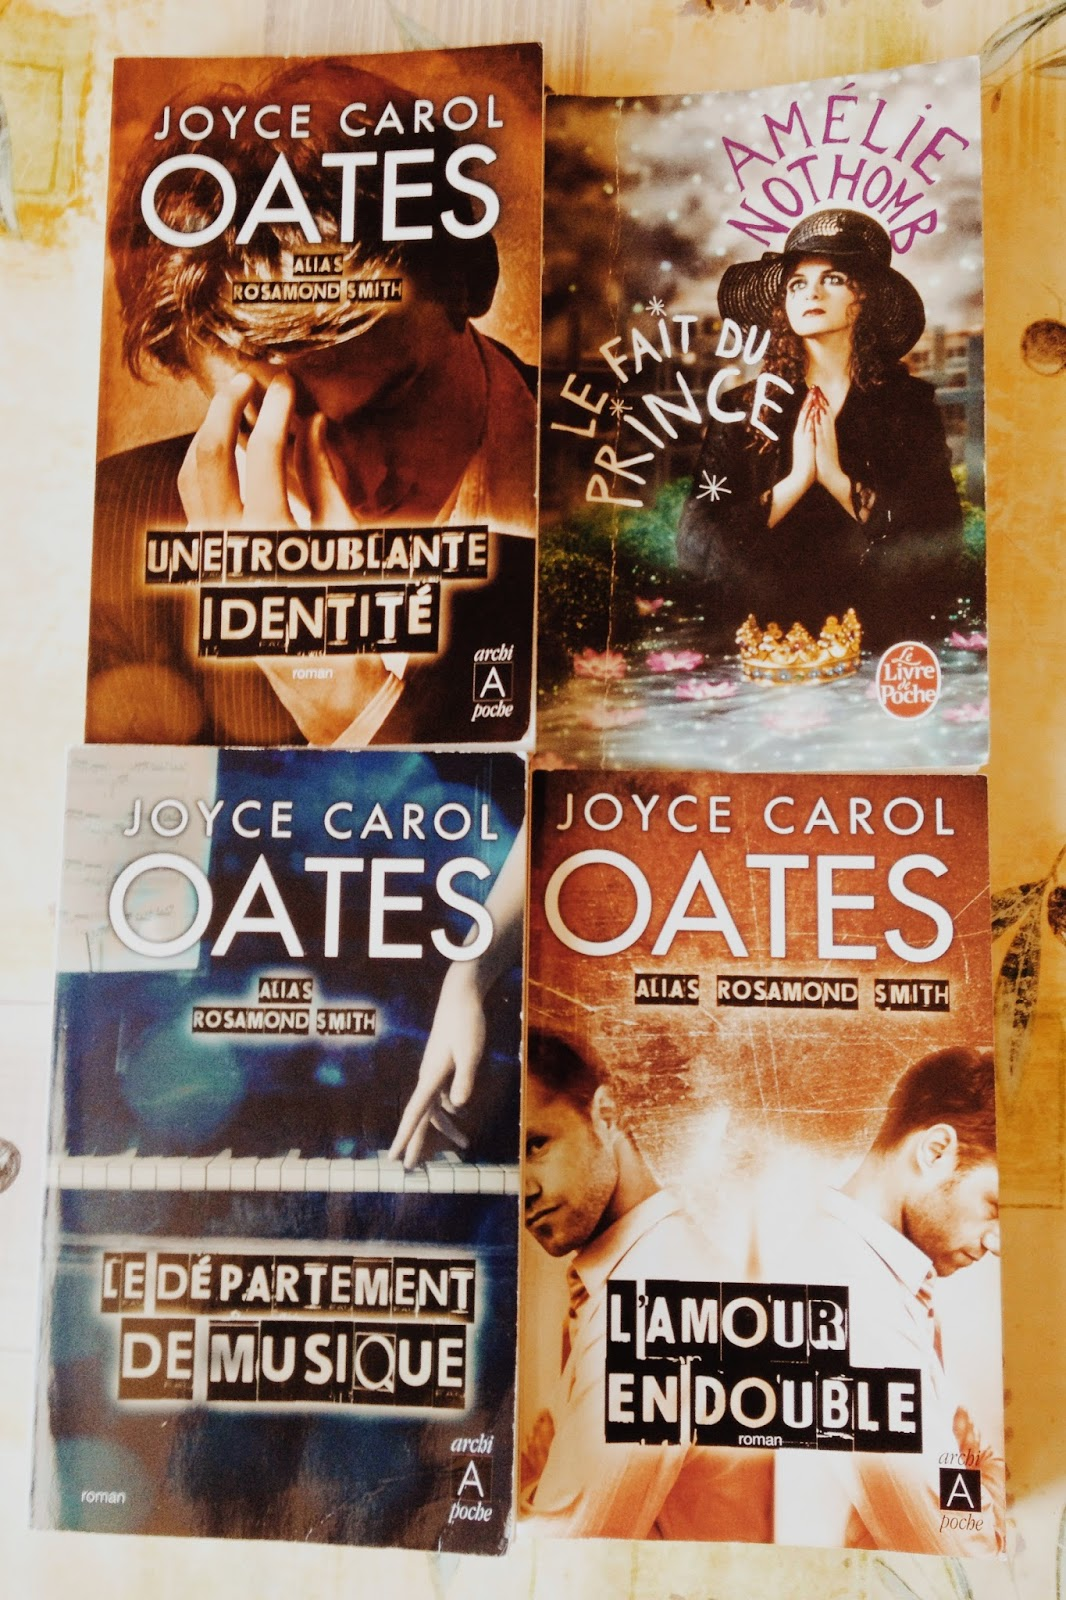 Couvertures Joyce Carol Oates Amelie Nothomb